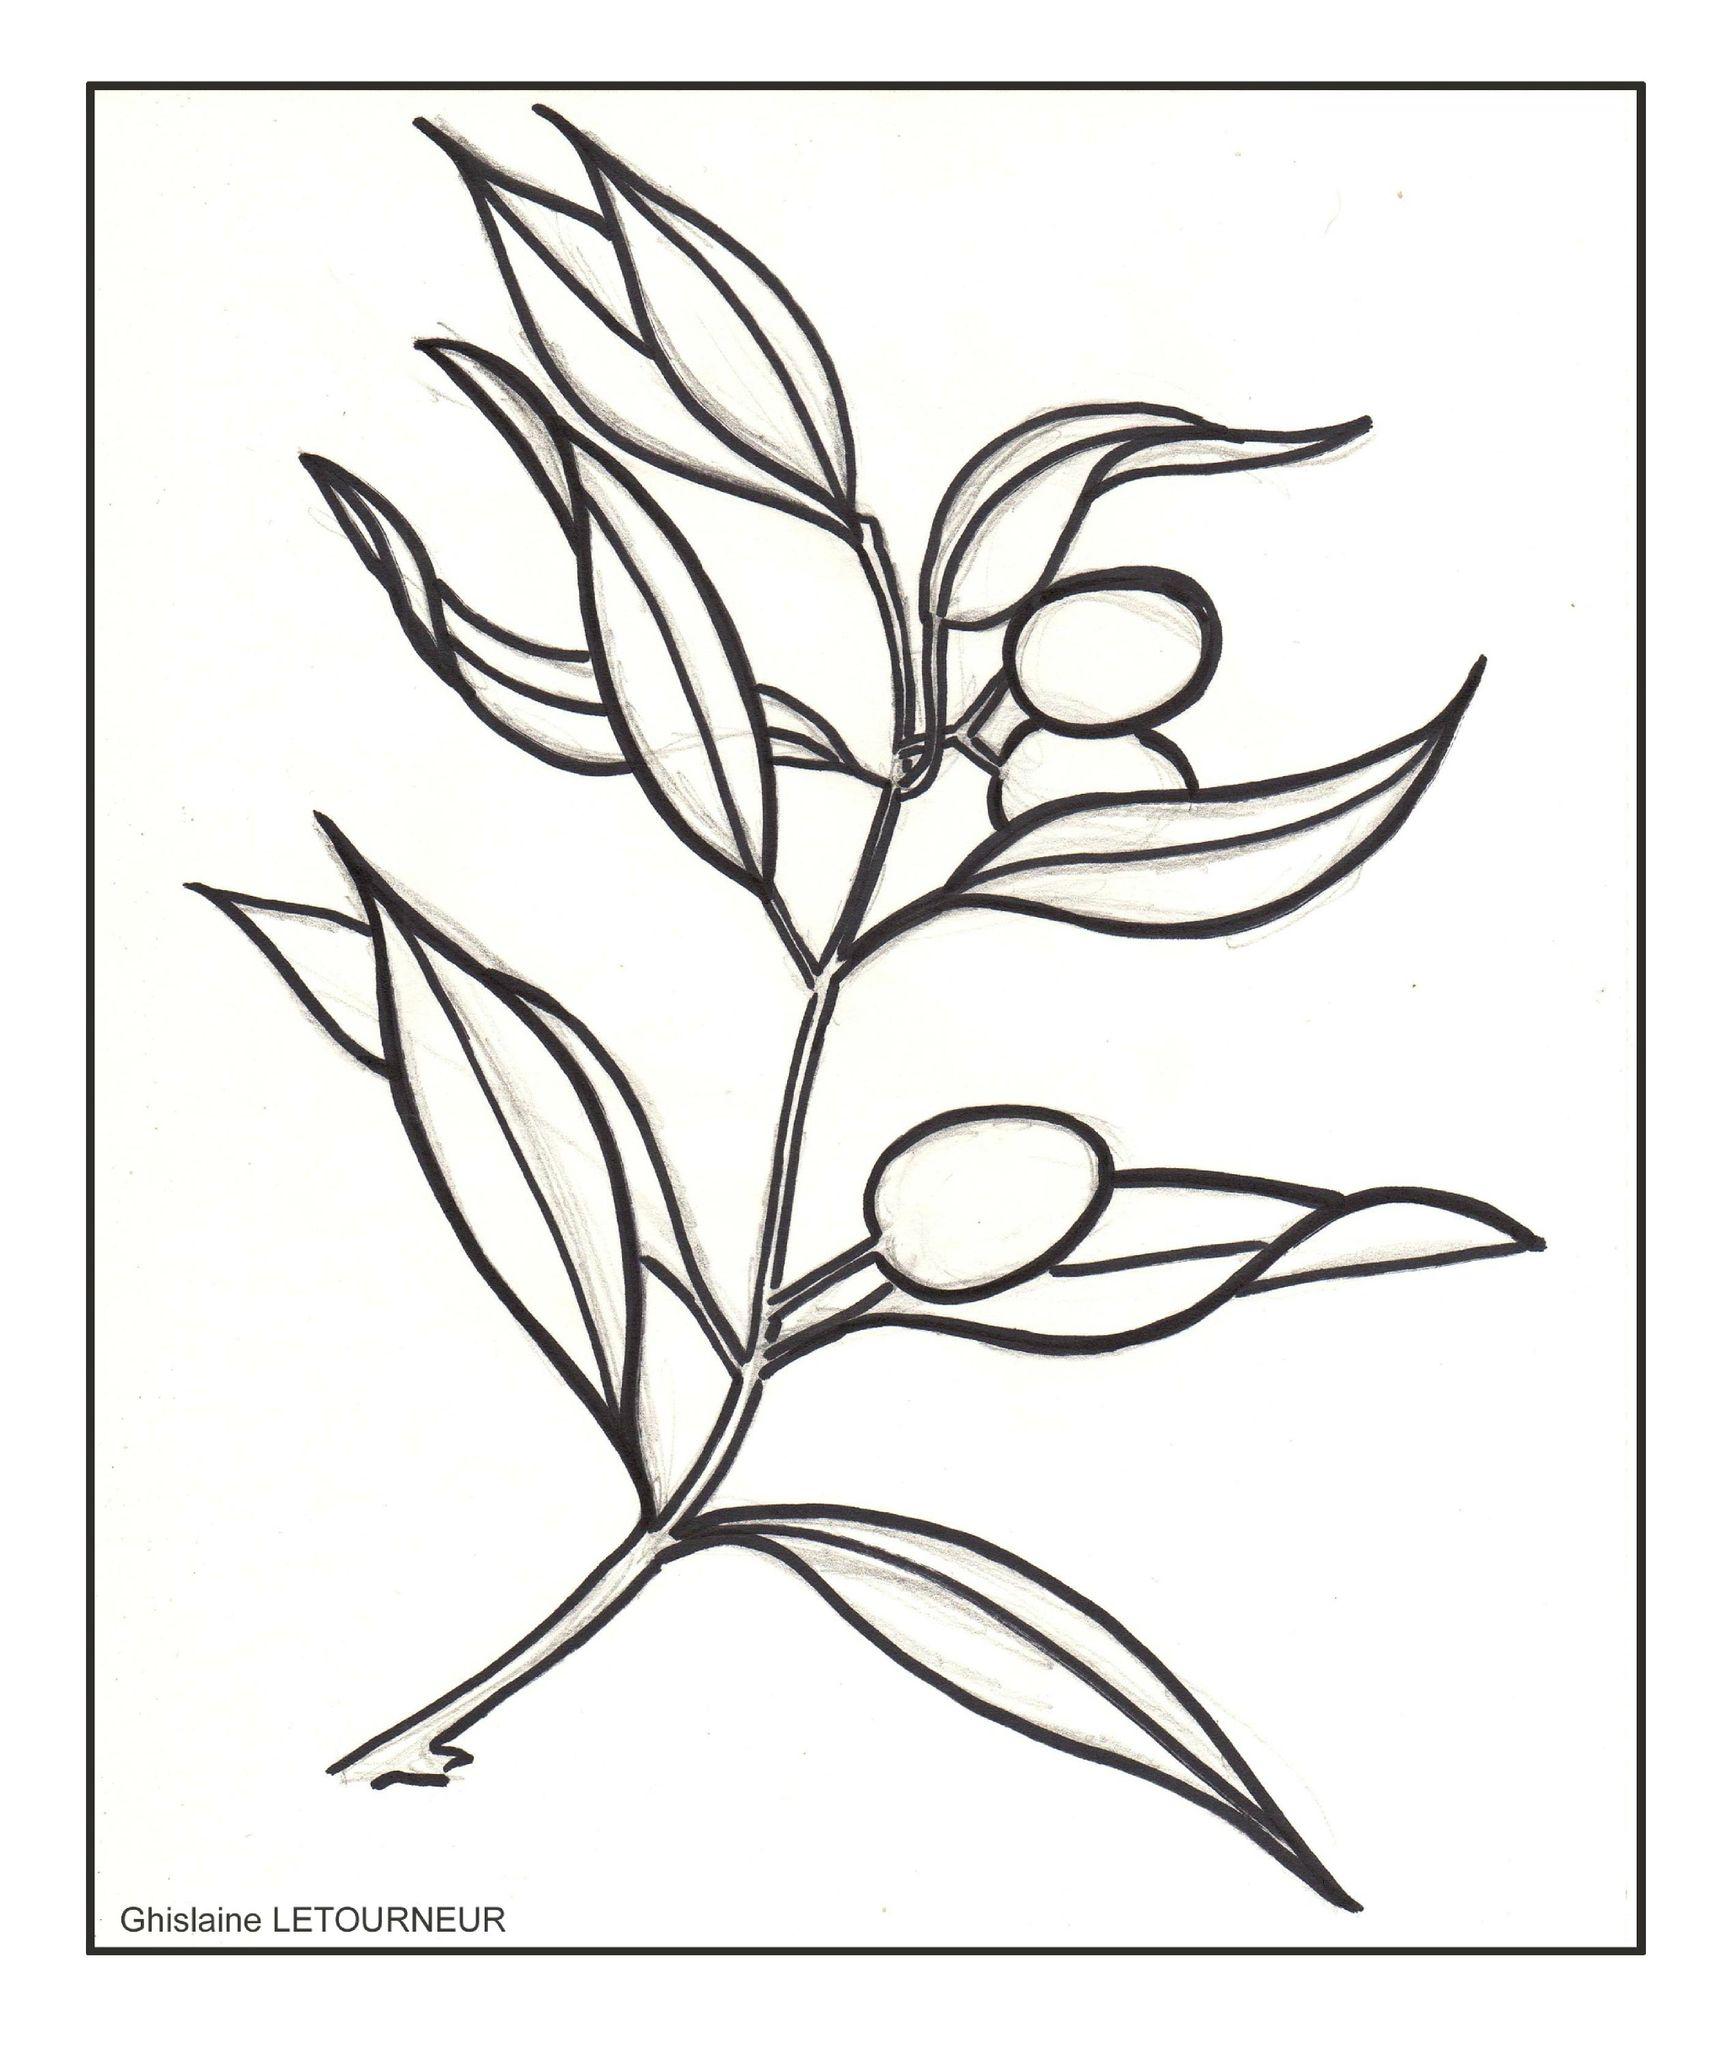 dessin coloriage branche d olivier photo de n. Black Bedroom Furniture Sets. Home Design Ideas